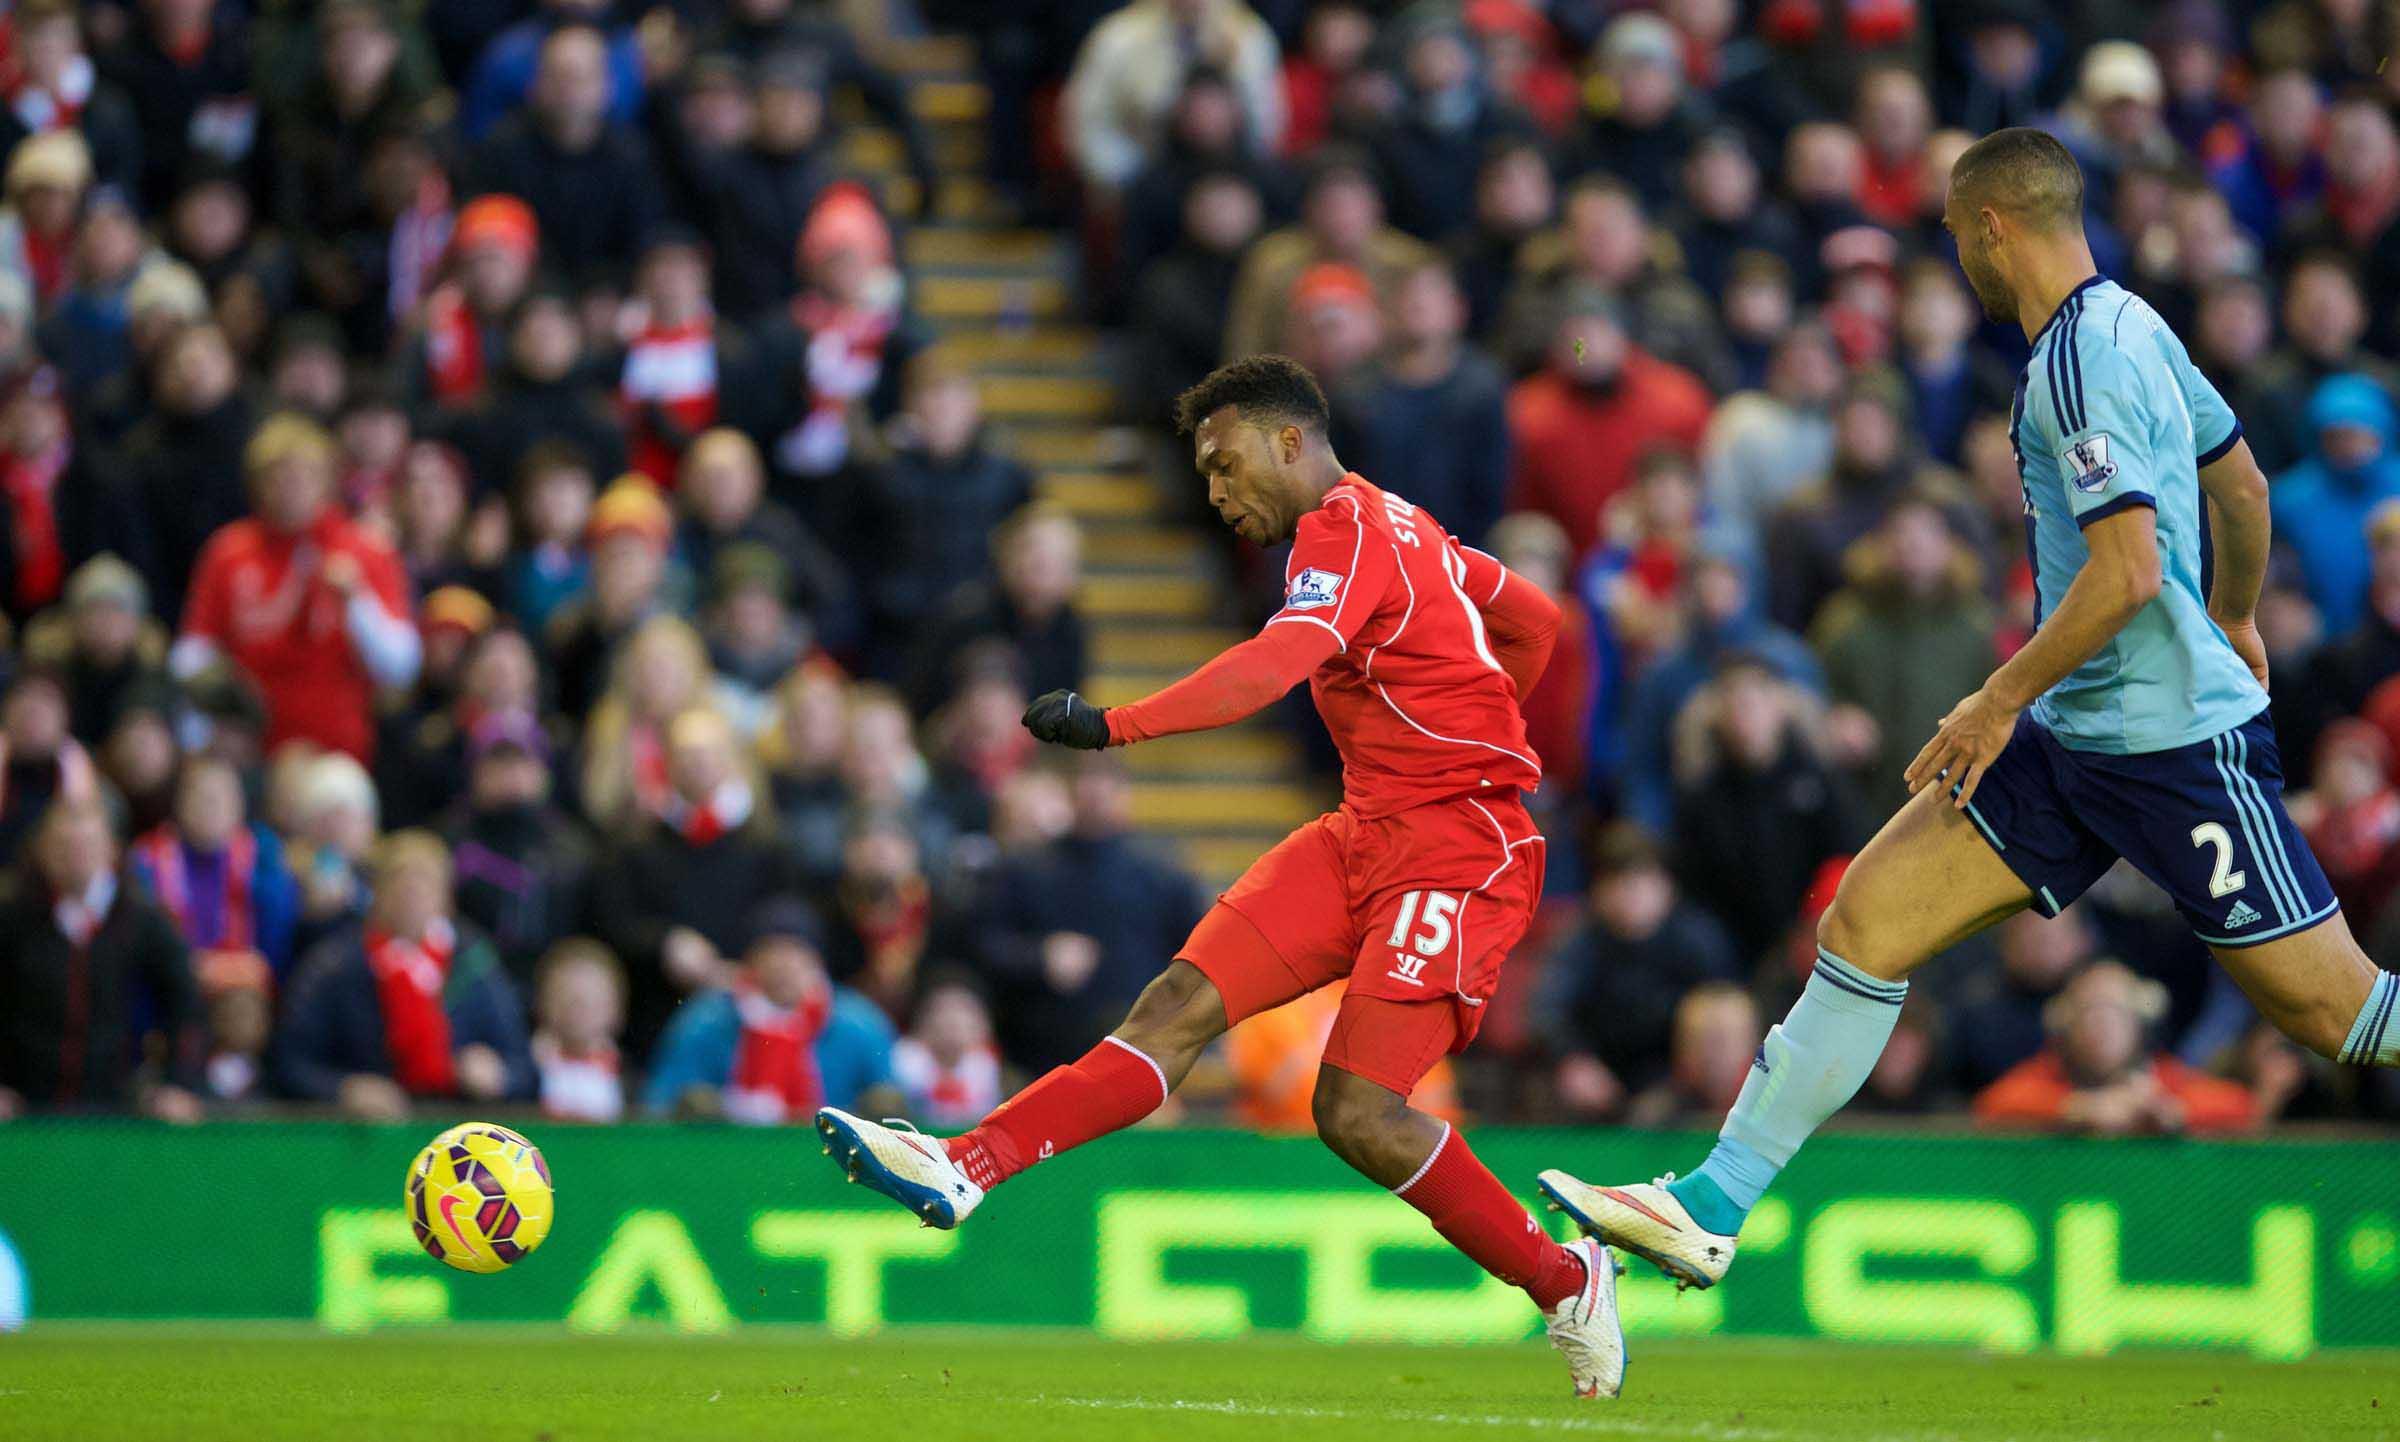 Football - FA Premier League - Liverpool FC v West Ham United FC